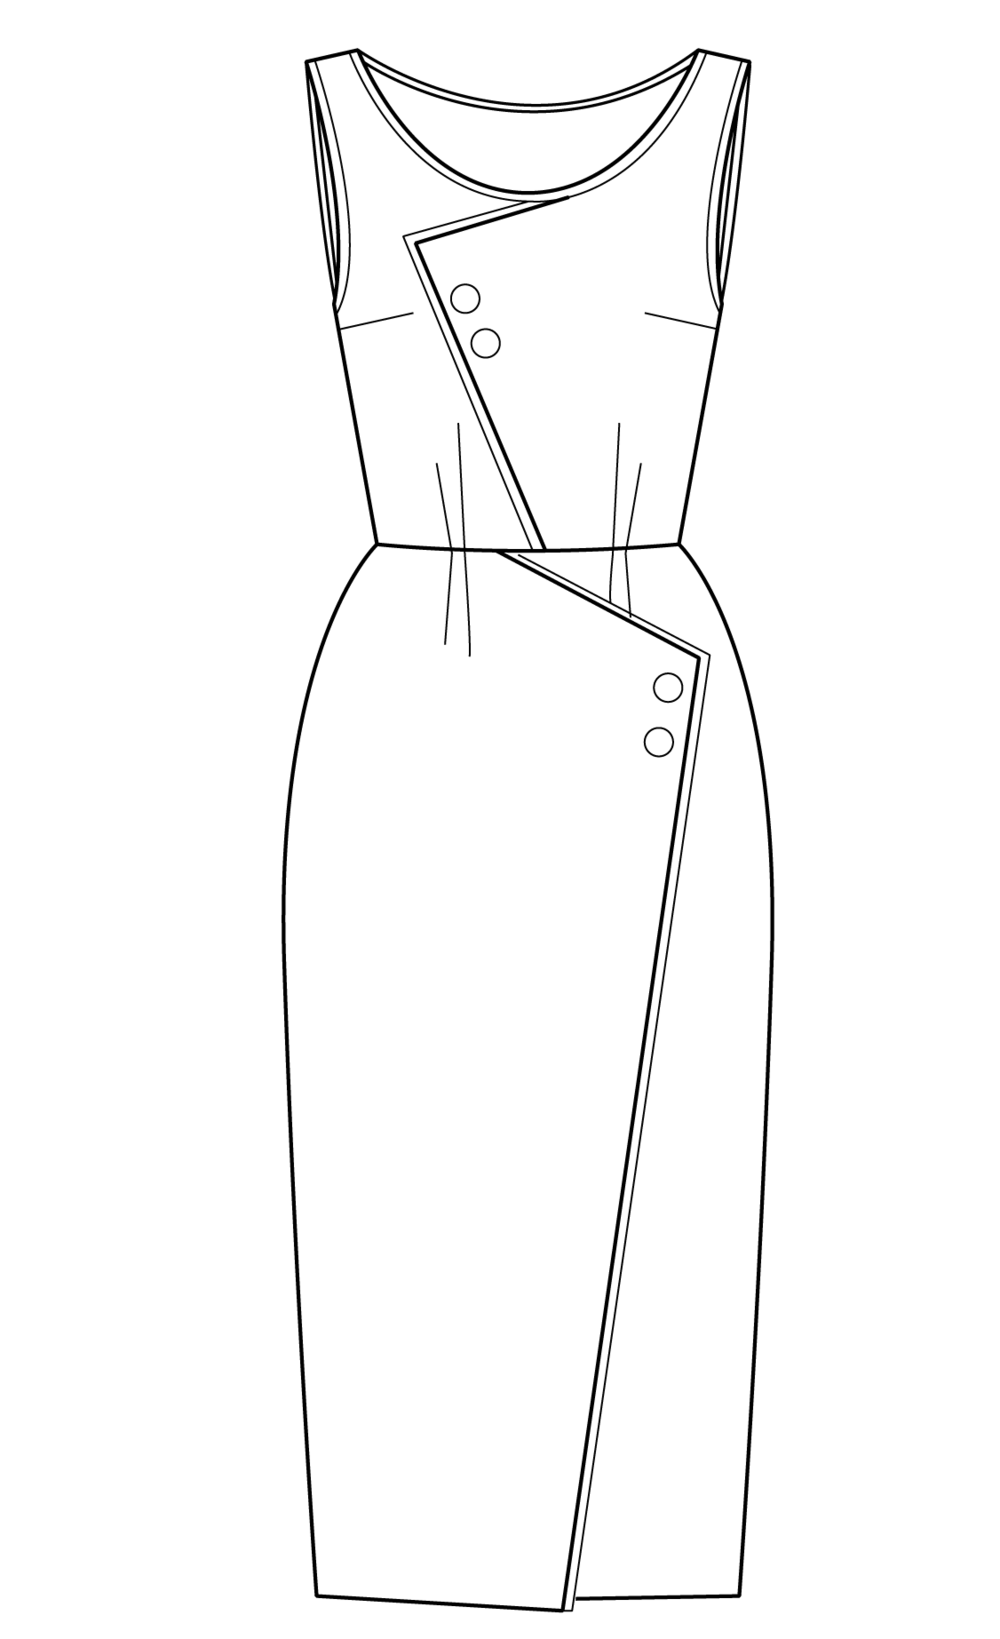 97a0a-no13_drawing_v1.png